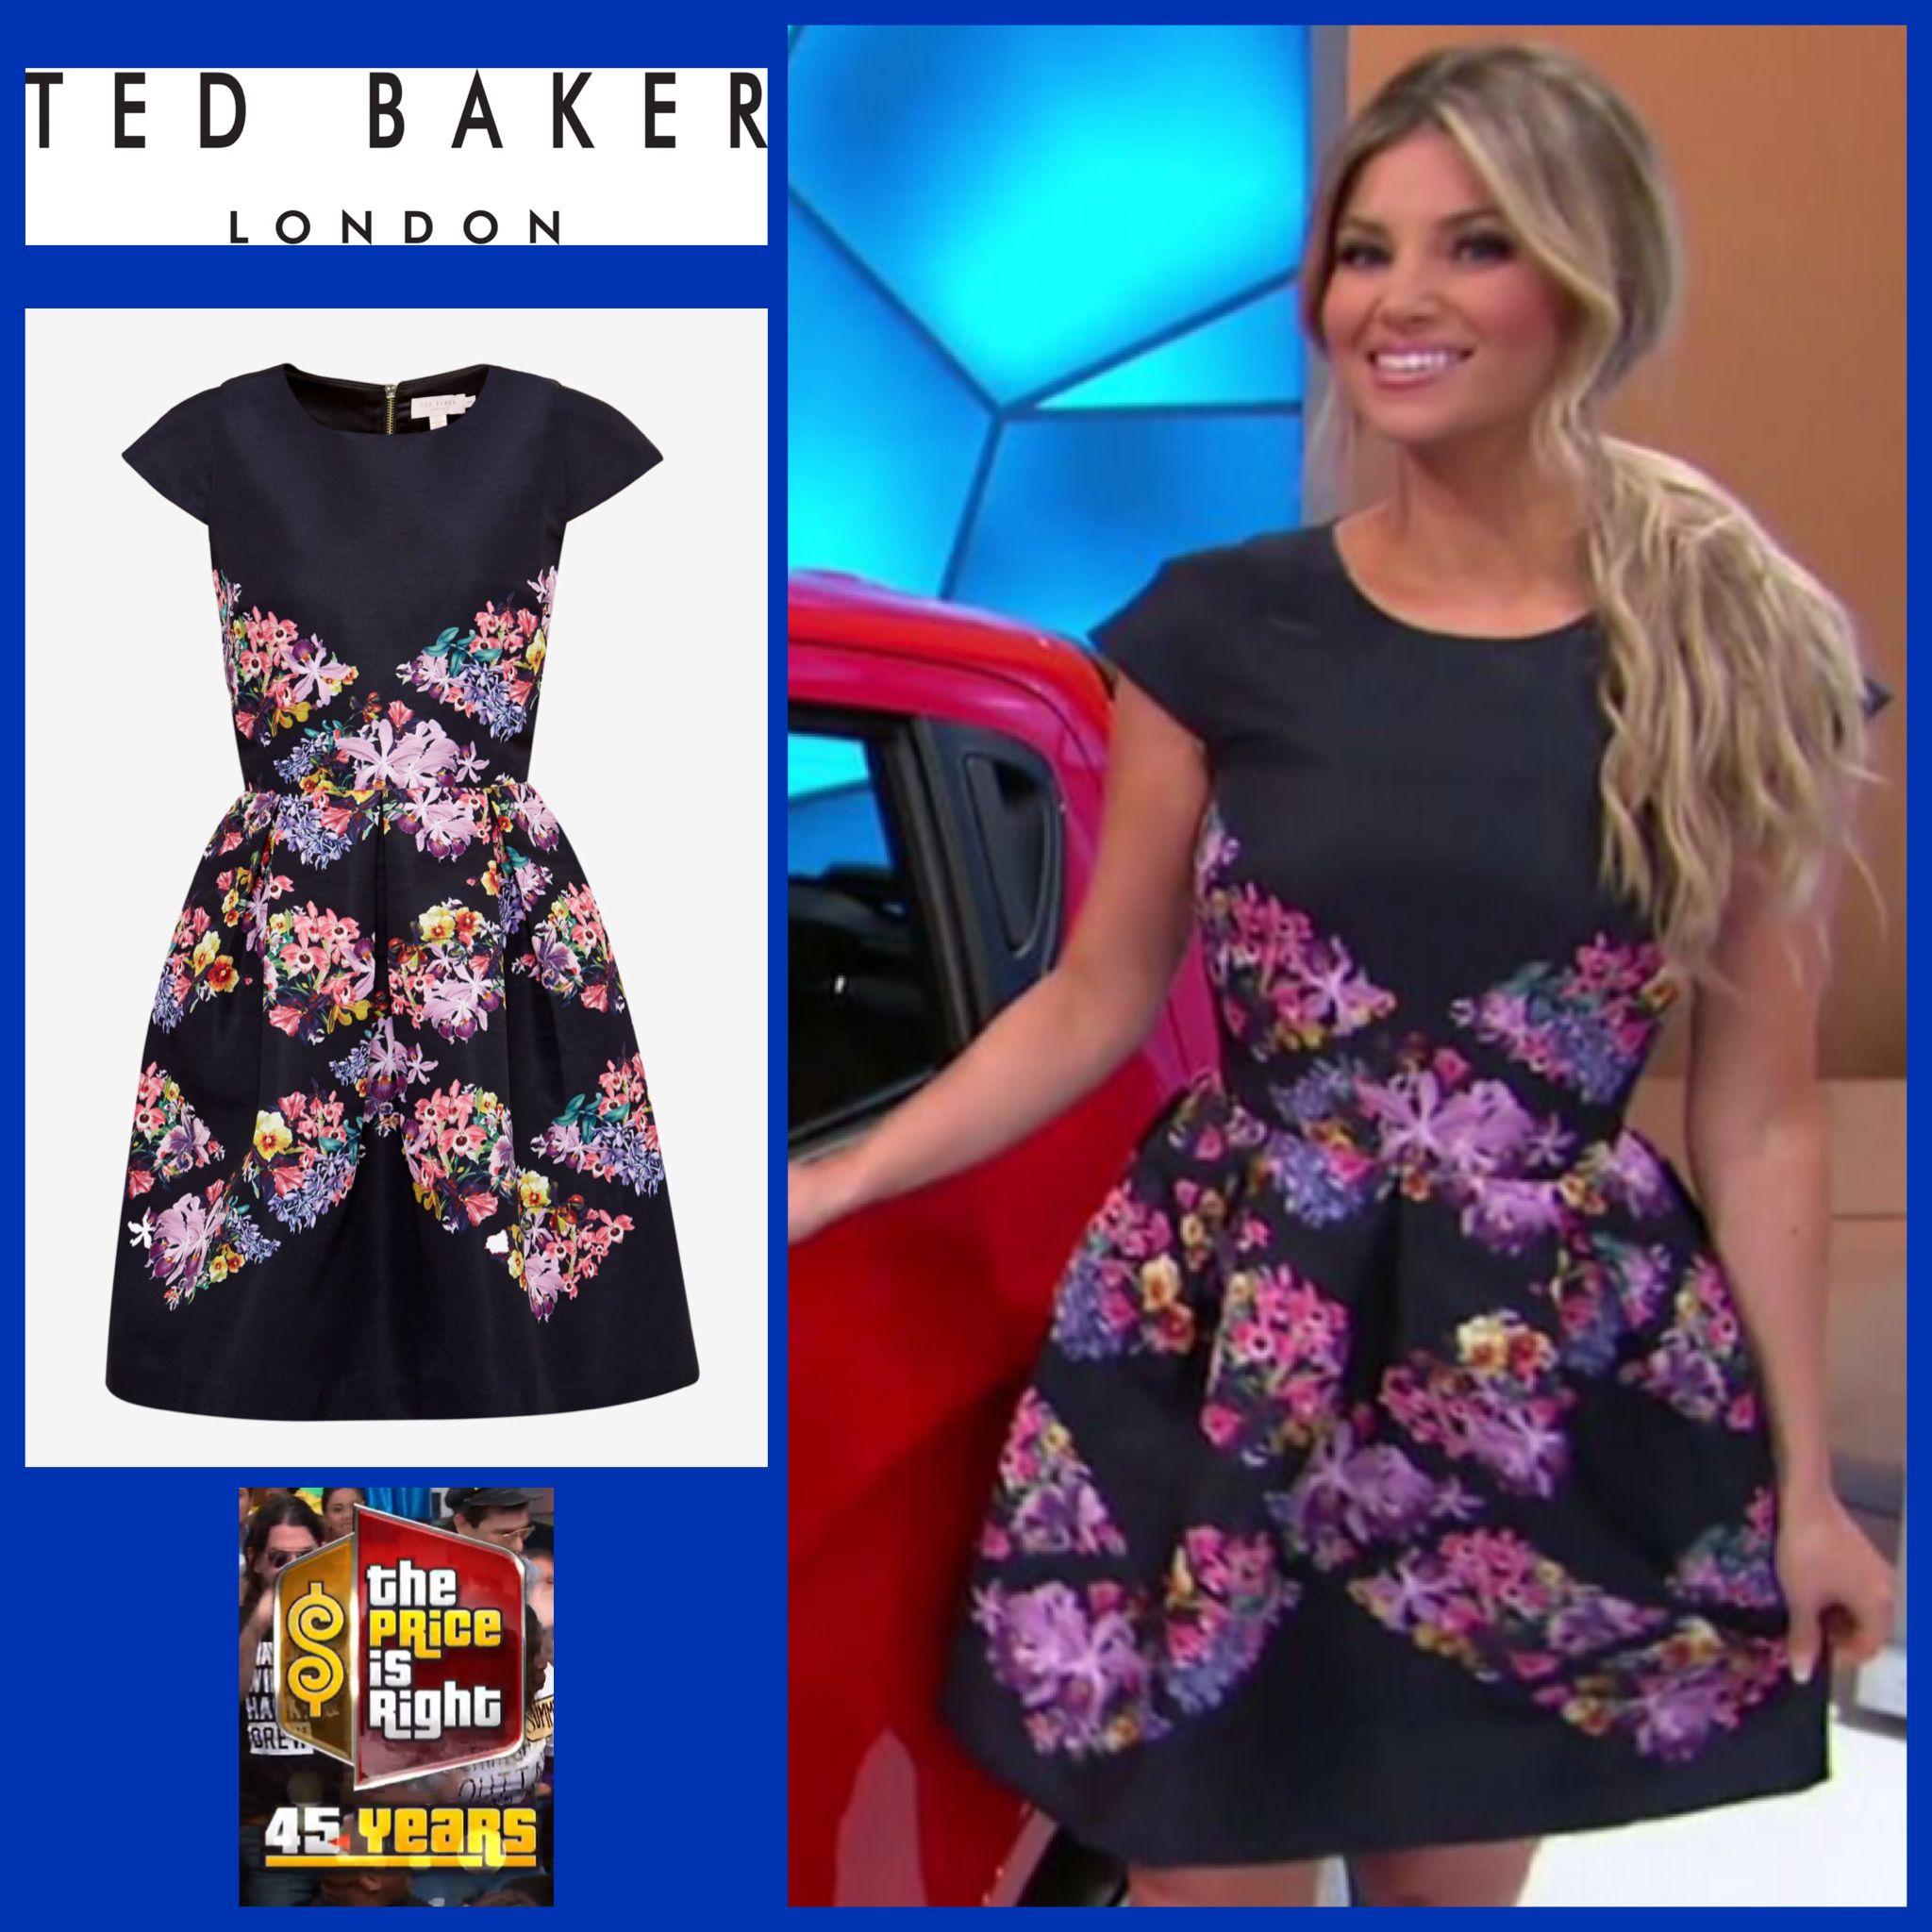 d95a59d9d TED BAKER LONDON Girley Lost Gardens Diamond Skater Dress in Black worn by  Amber Lancaster